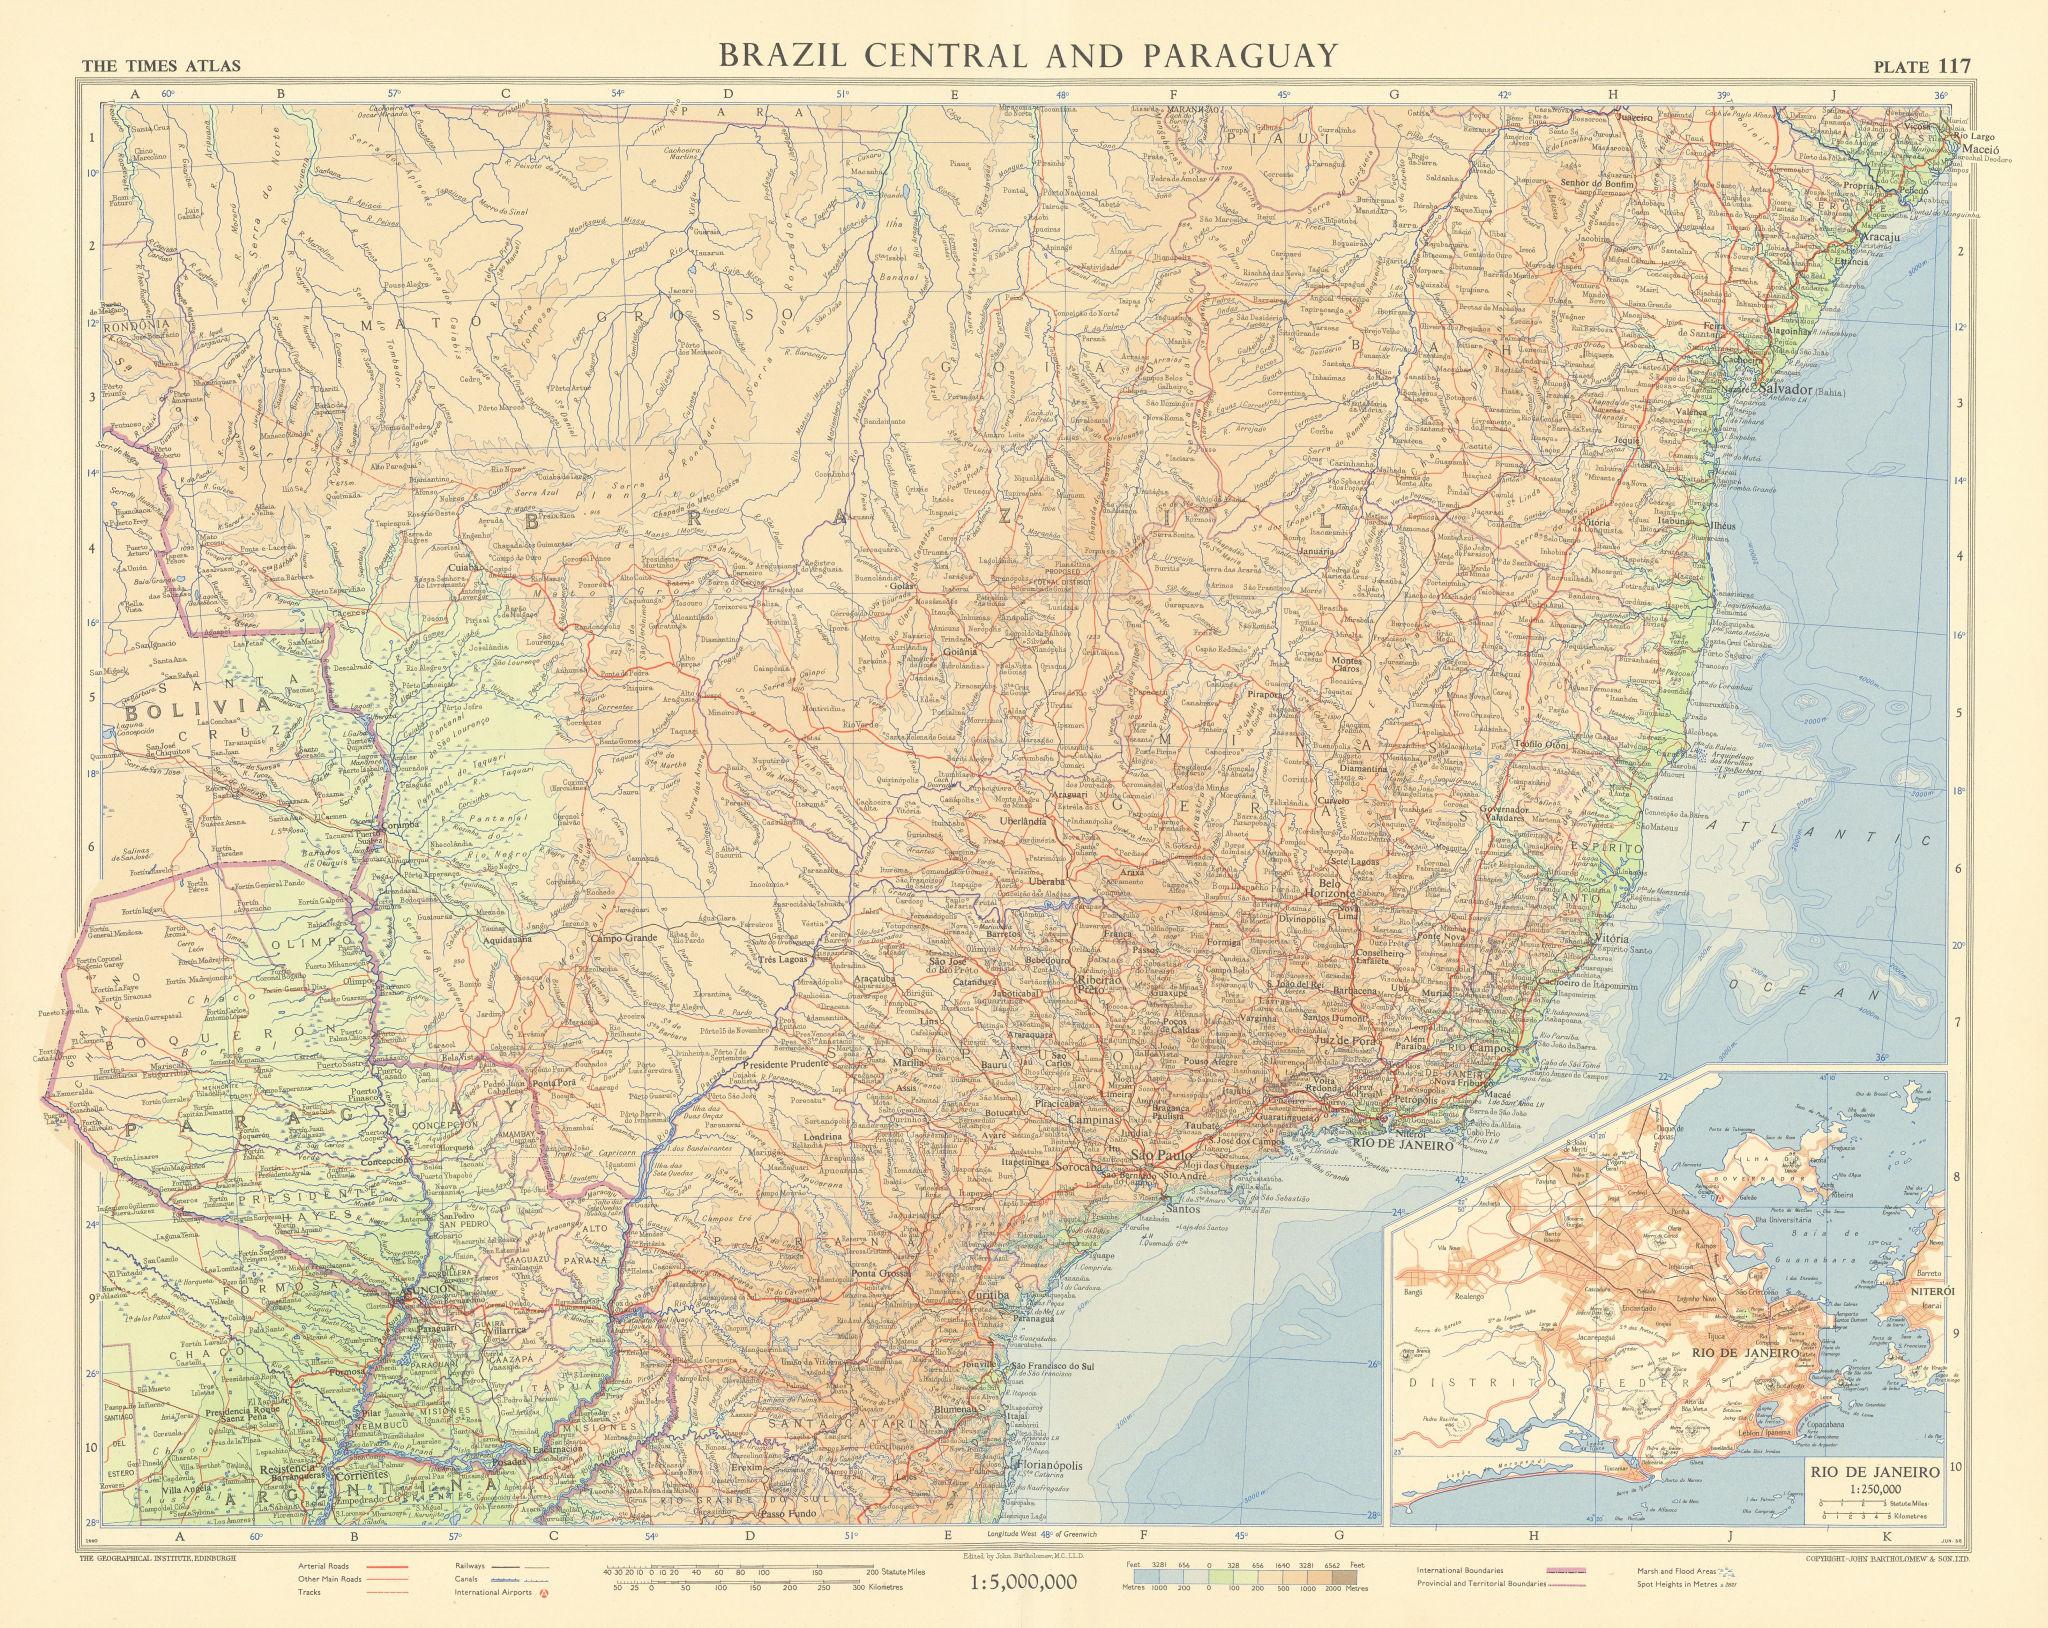 Brazil central & Paraguay. Rio de Janeiro environs. TIMES 1957 old vintage map